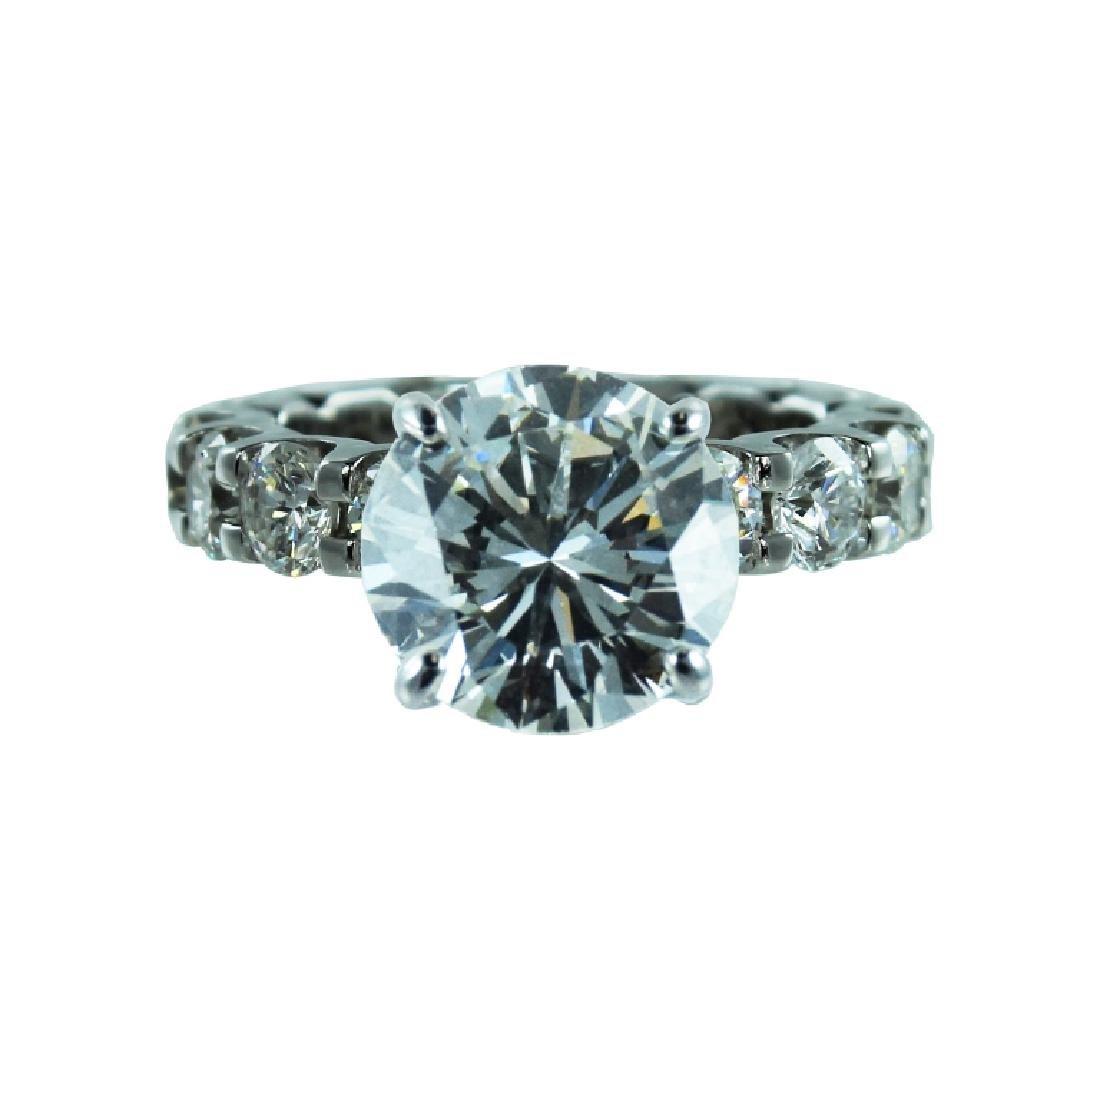 GIA Certified, 14K 4.14 Carats Diamond Ring